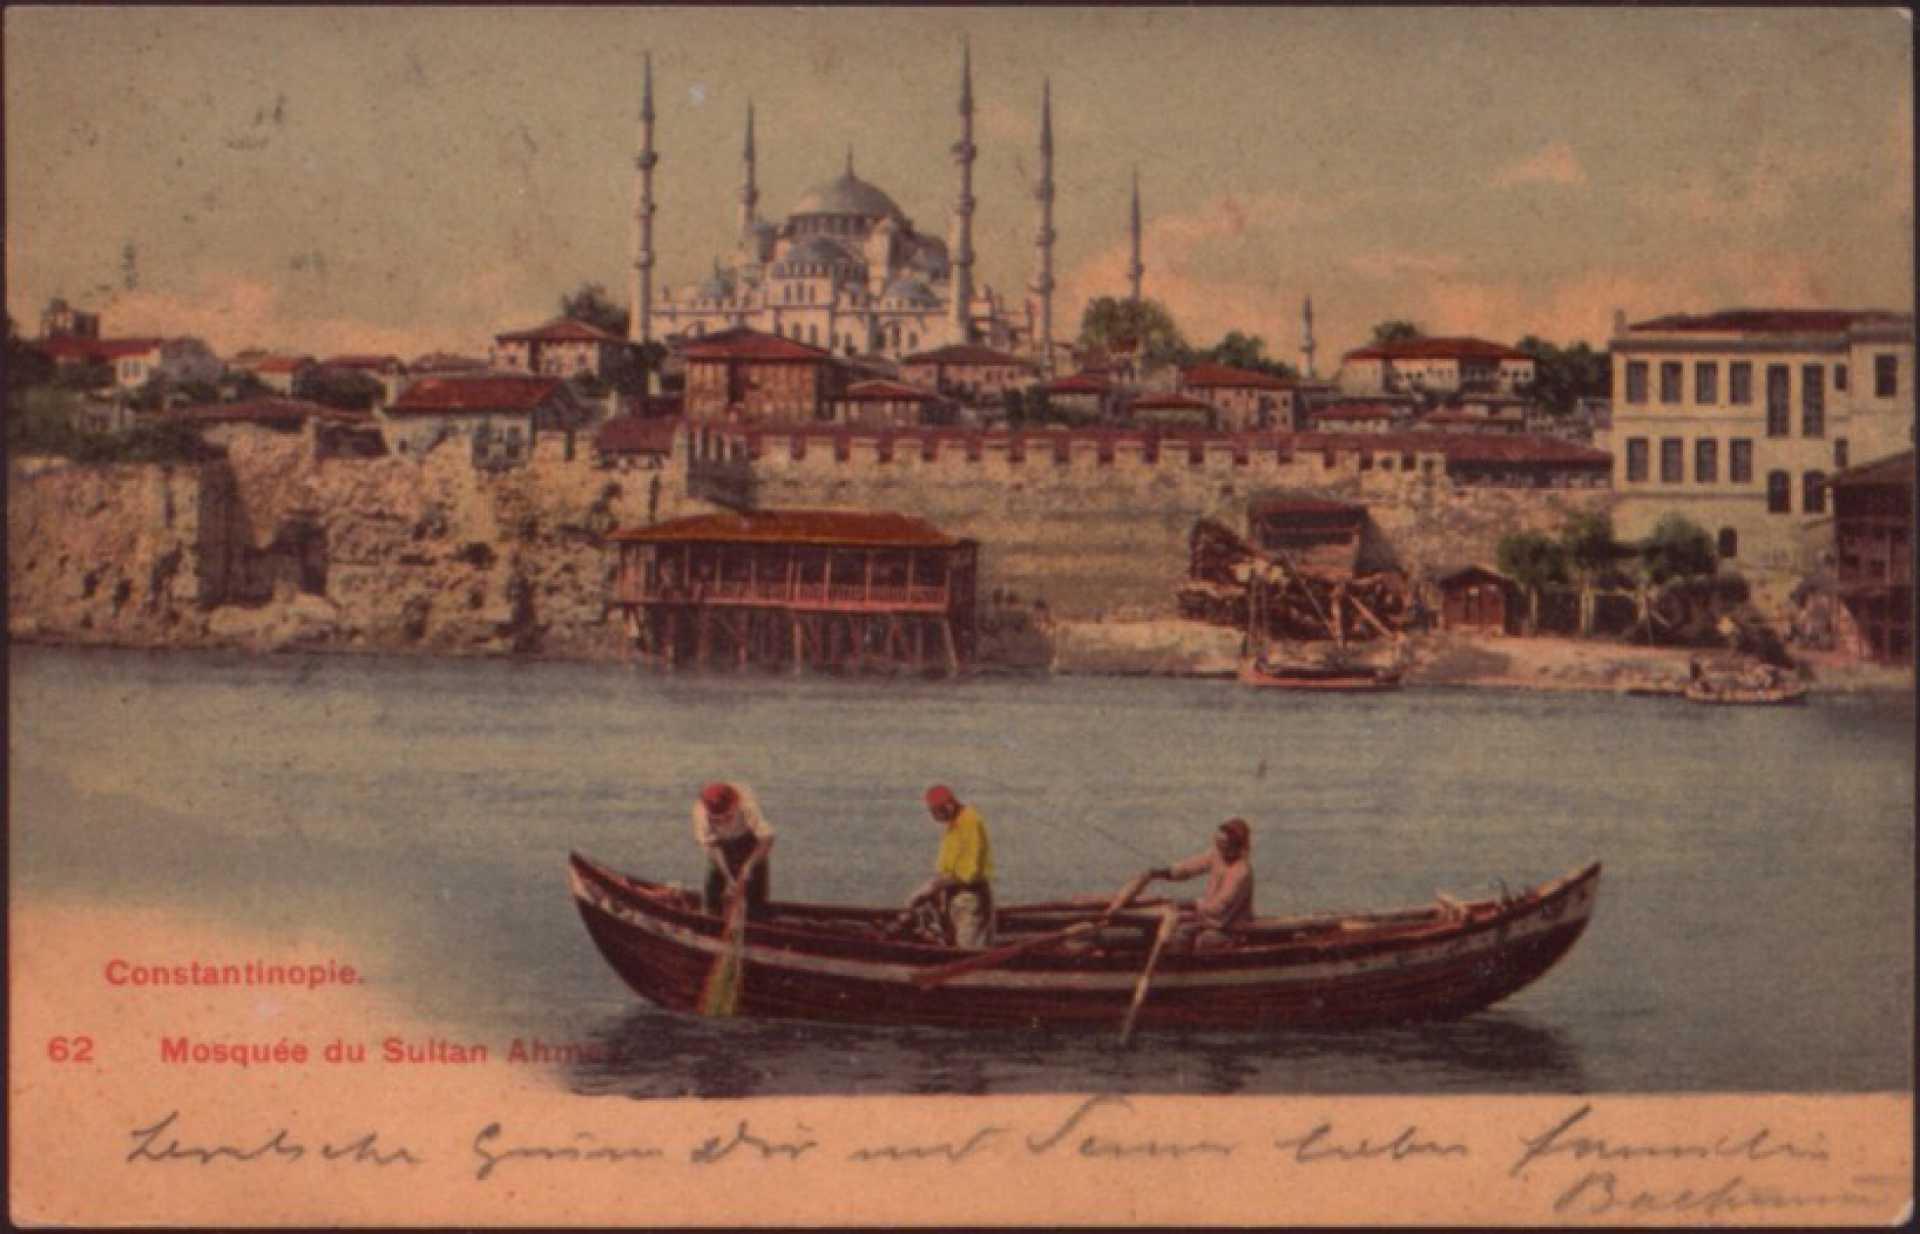 Mosquee du Sultan Ahmed